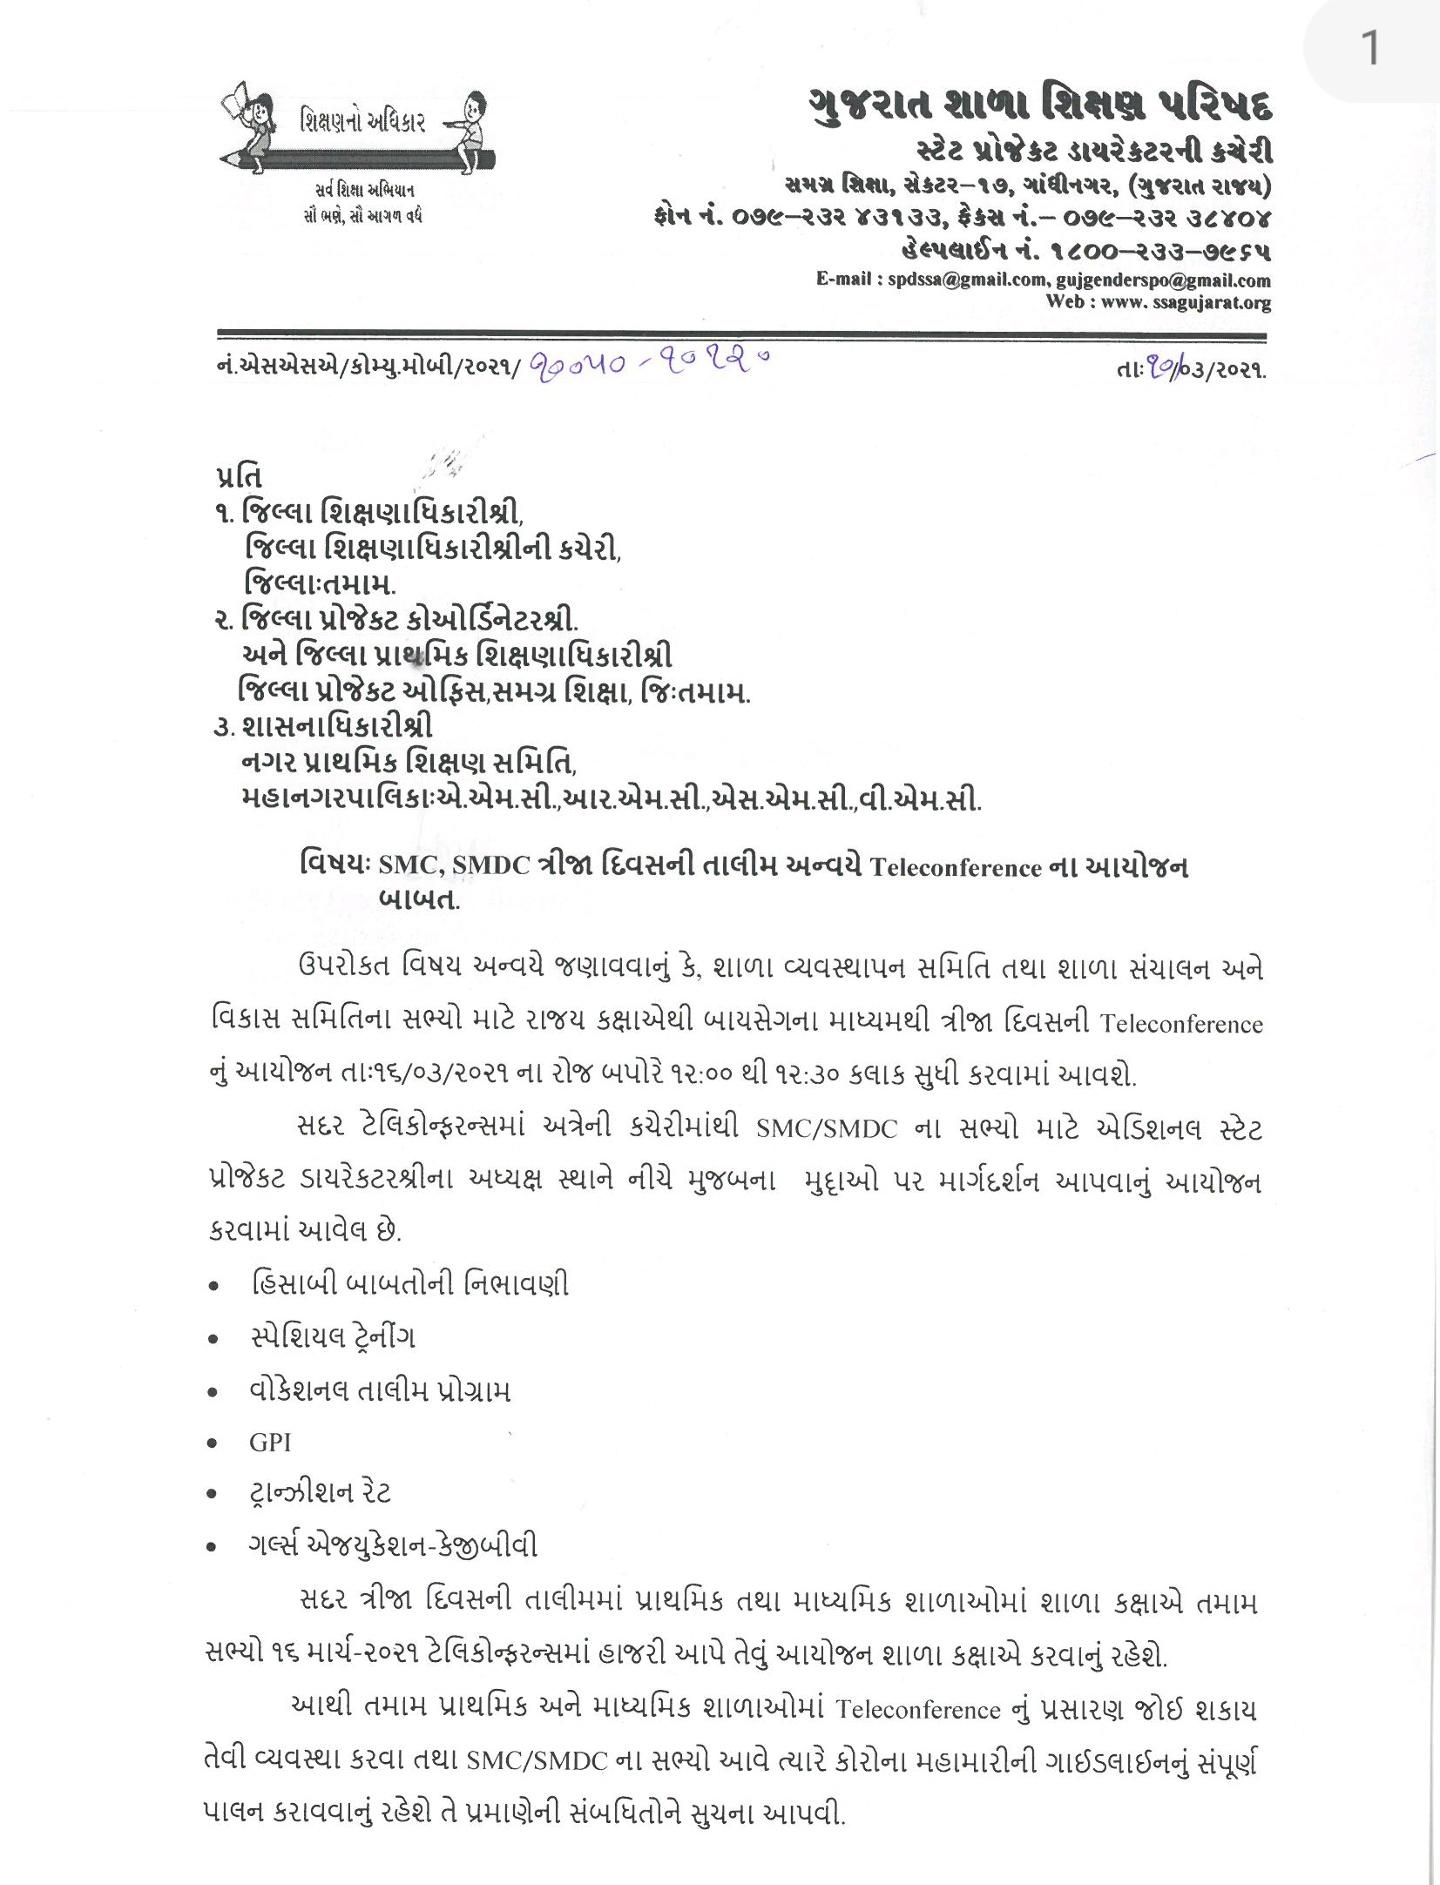 https://project303.blogspot.com/2021/03/smc-teleconference-talim-paripatra.html